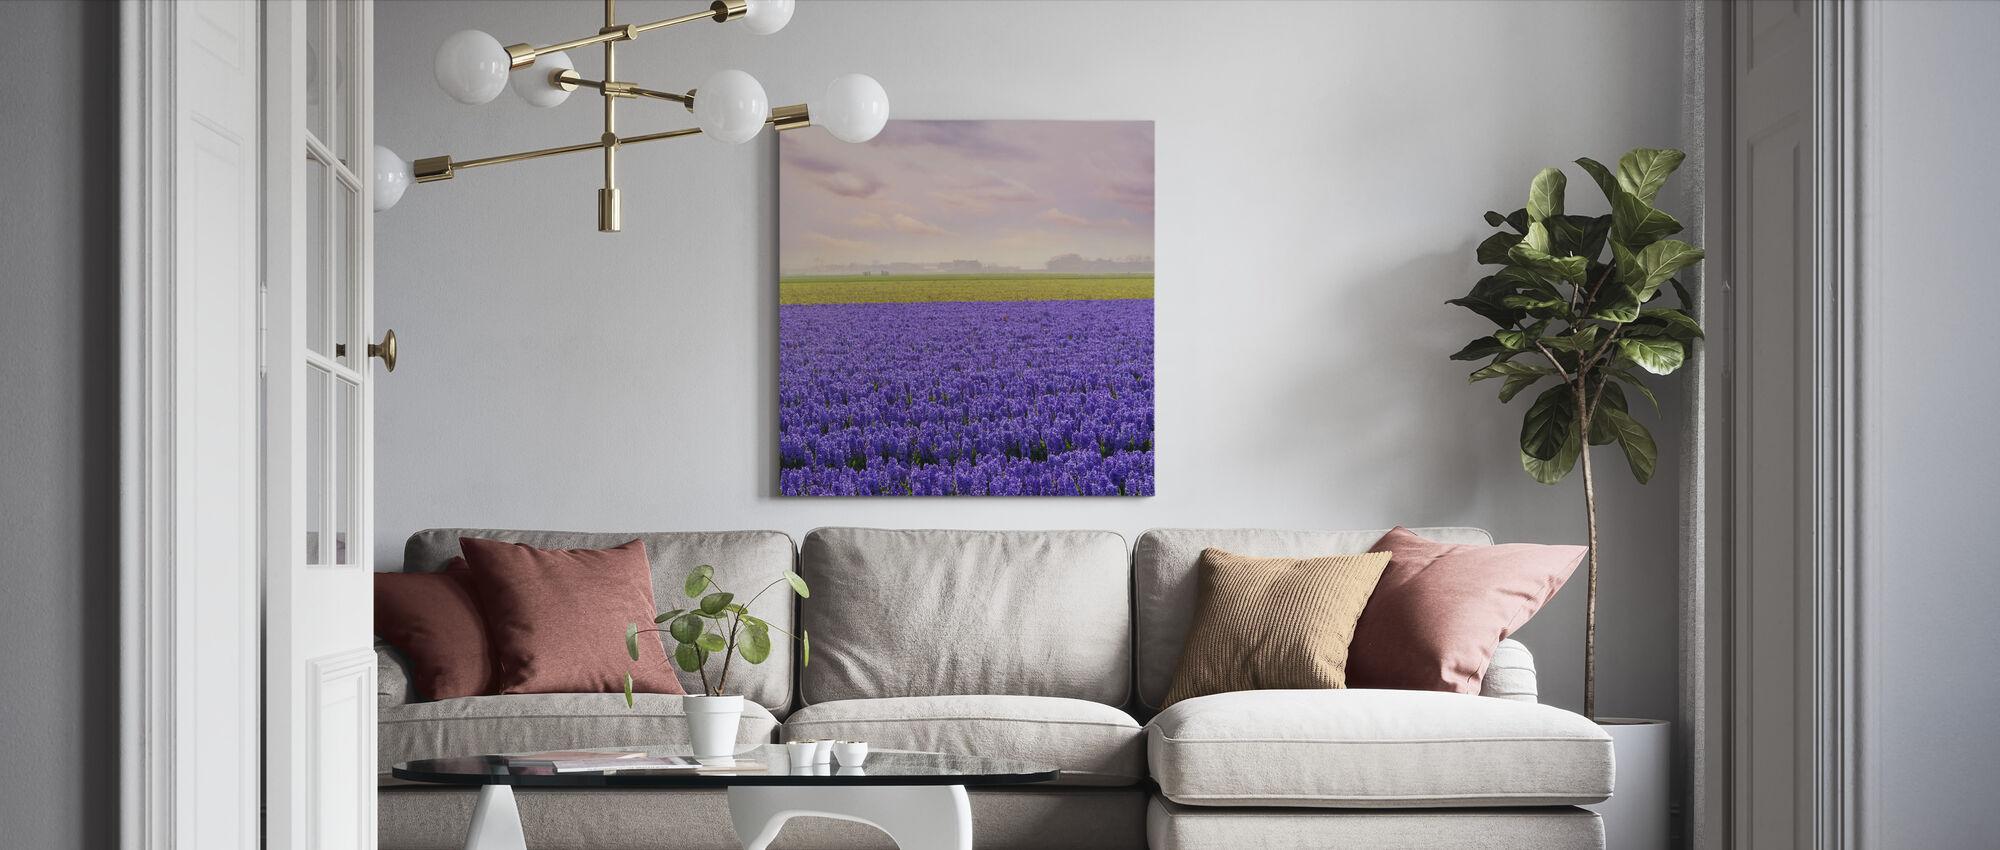 Violetti Hyasintti - Canvastaulu - Olohuone